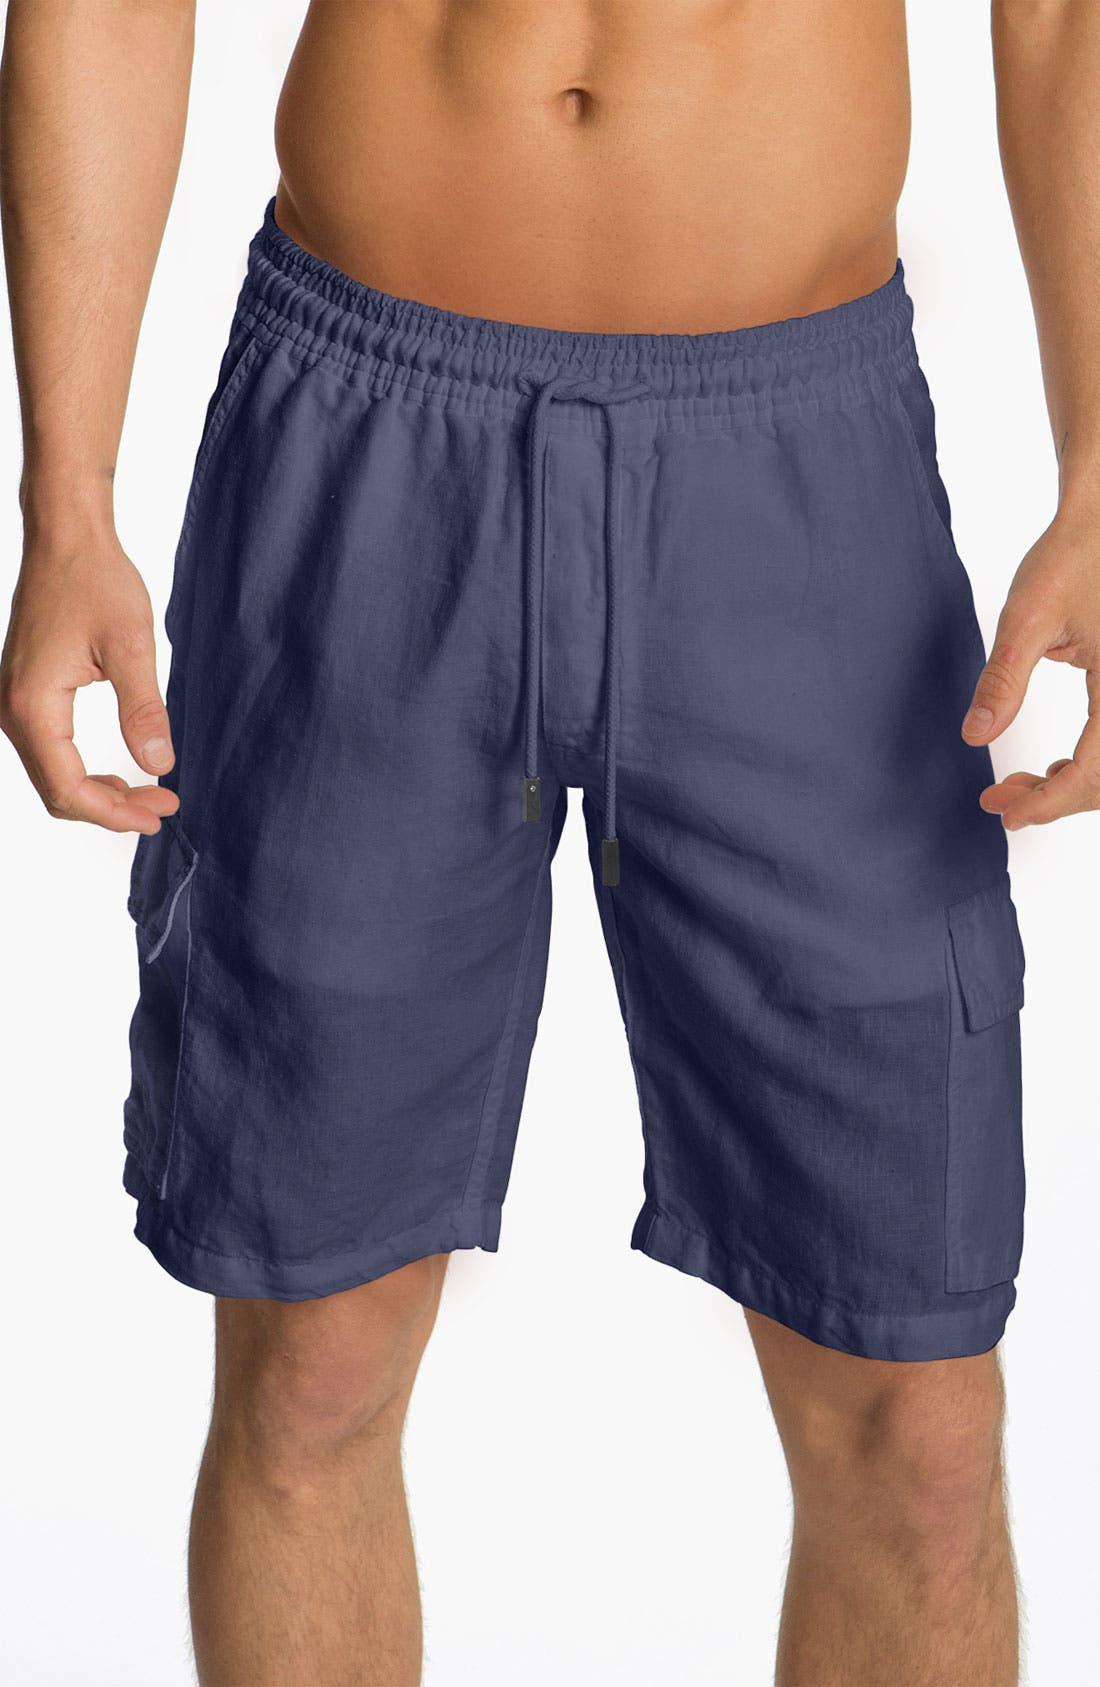 Main Image - Vilebrequin 'Baie' Linen Shorts